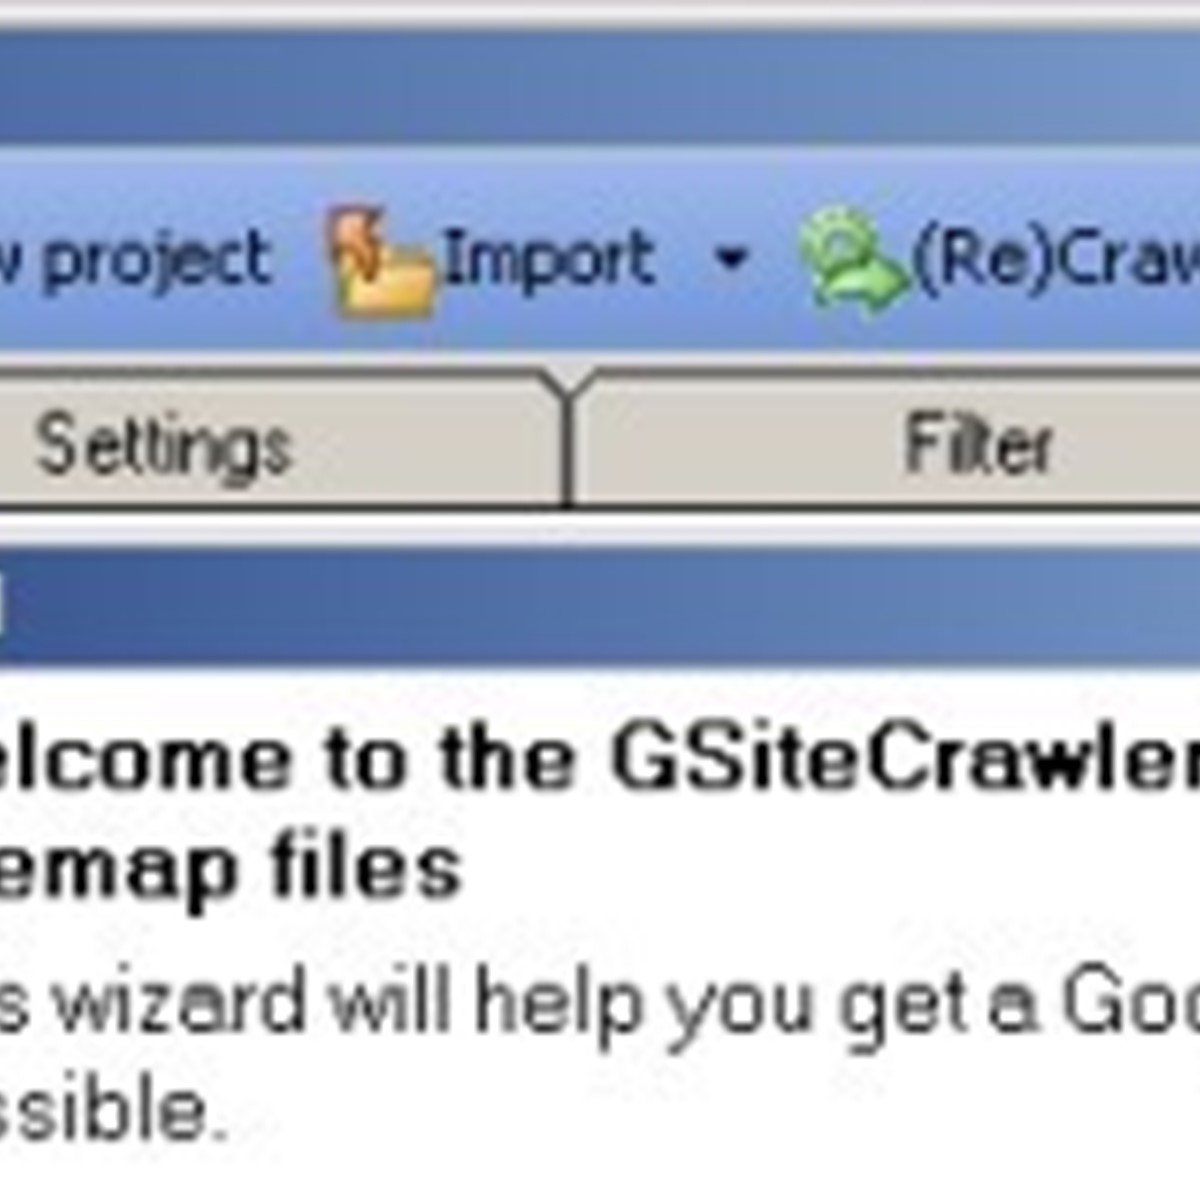 gsitecrawler alternatives and similar software alternativeto net